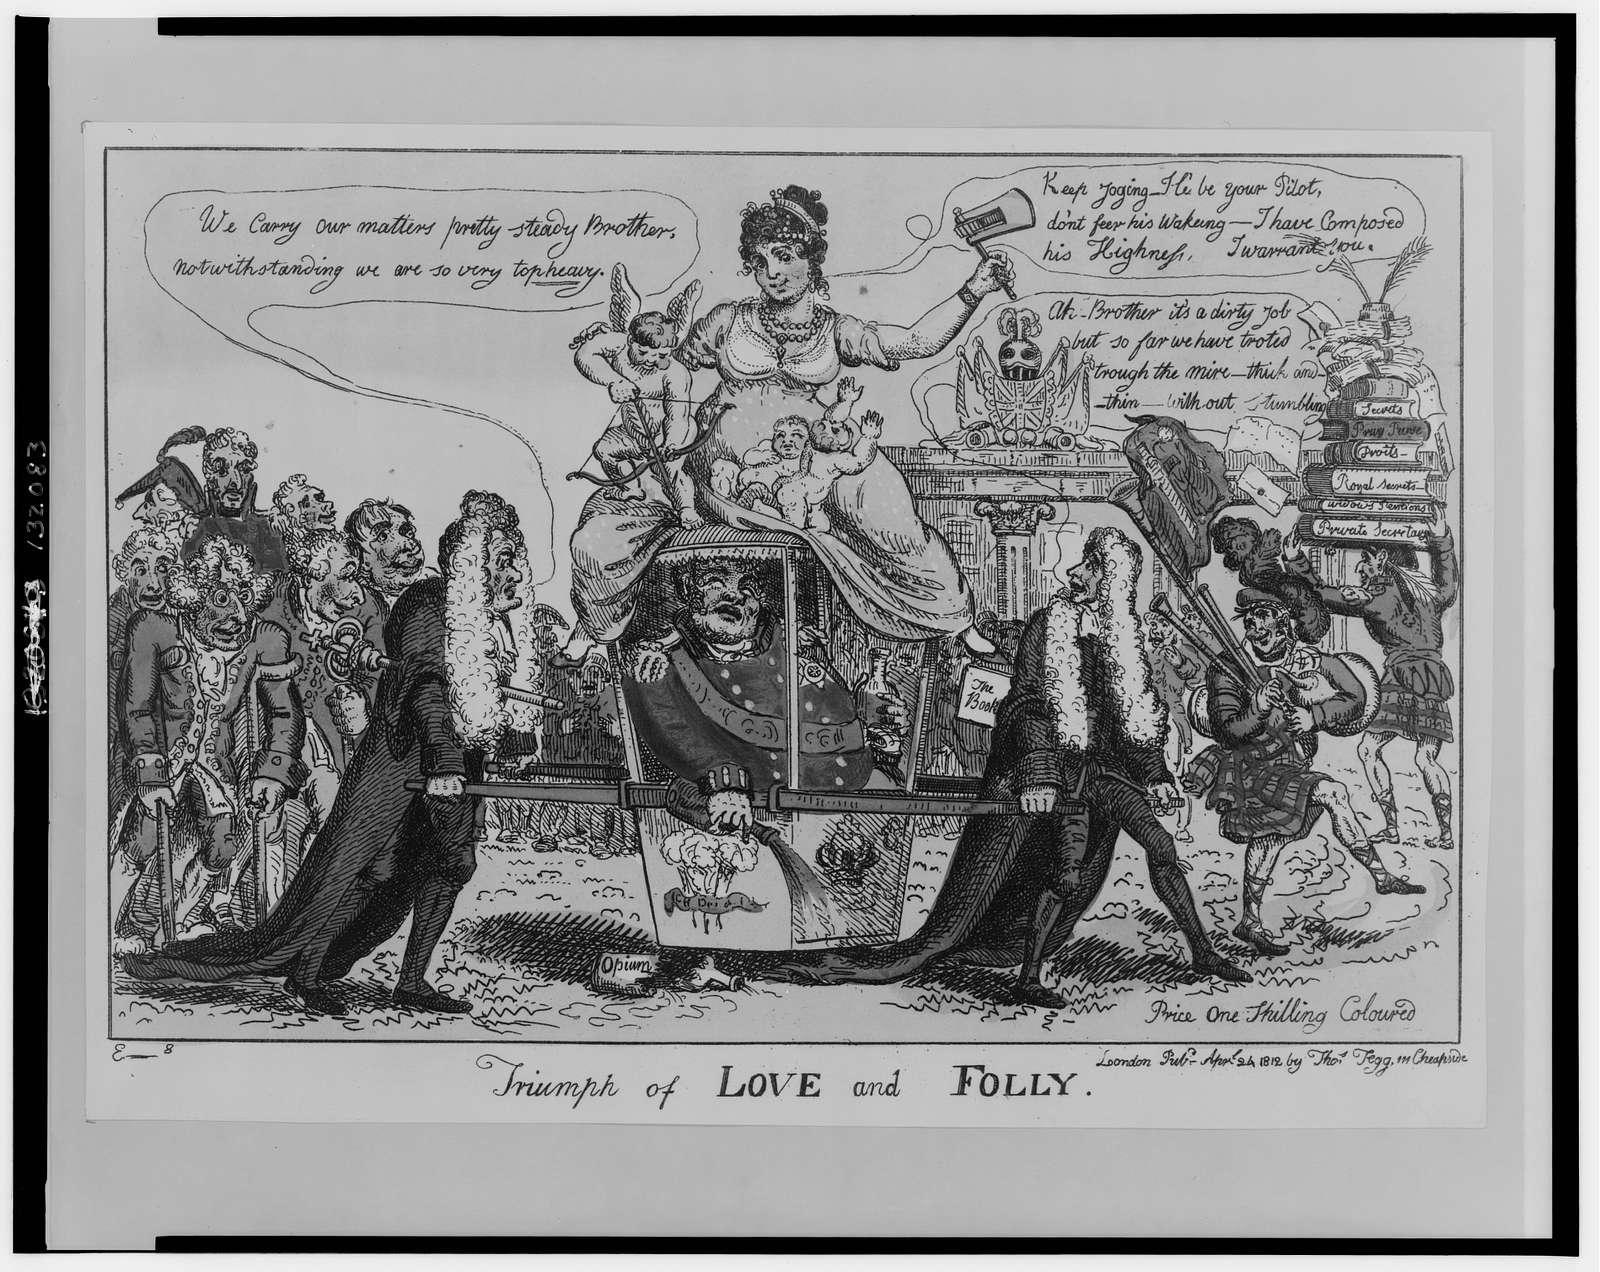 Triumph of love and folly / E--s [Elmes].